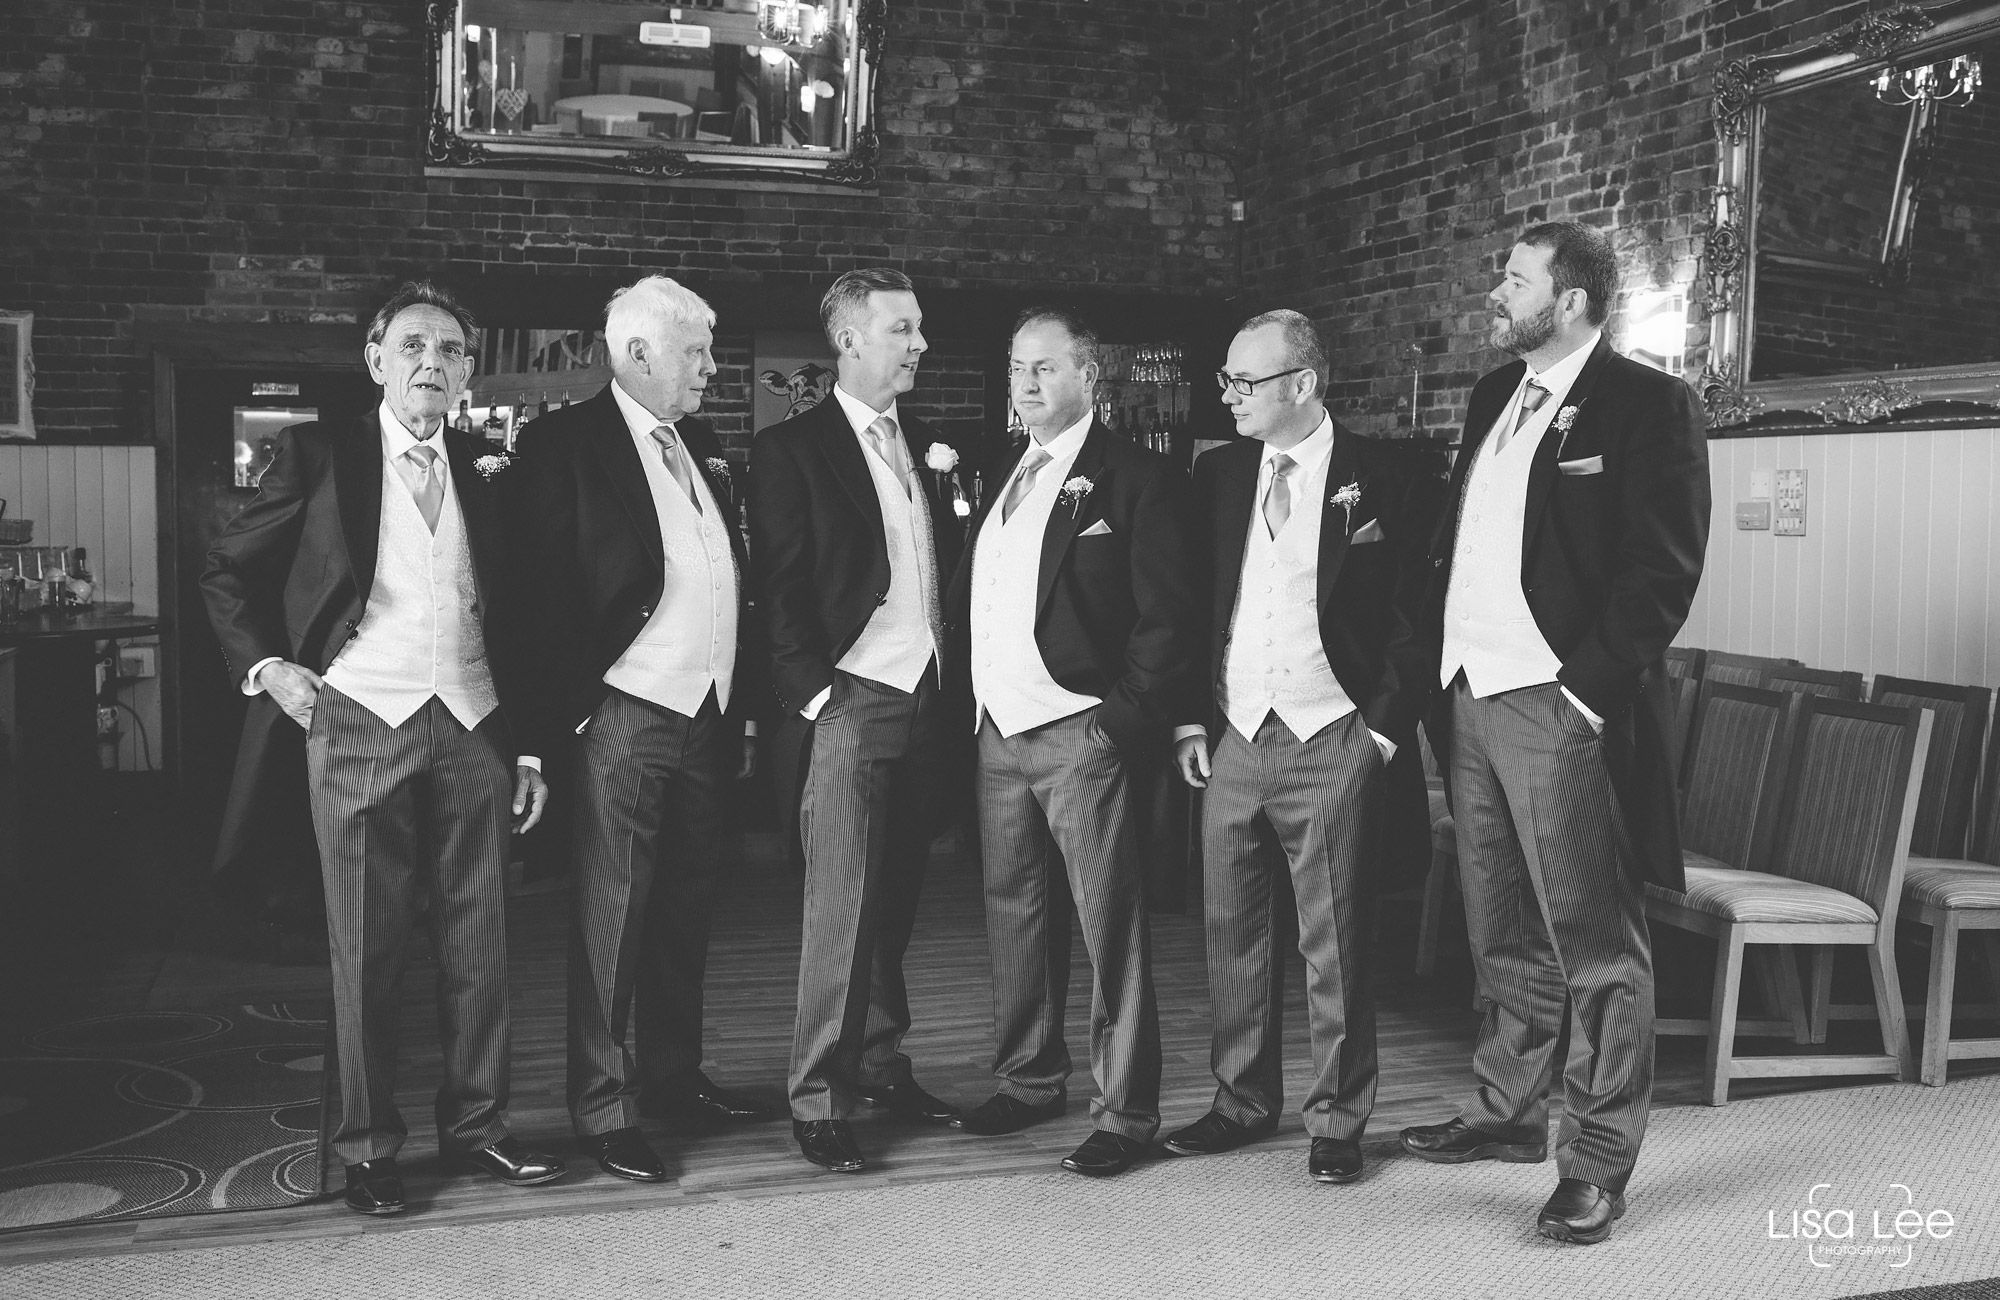 lisa-lee-wedding-photography-group.jpg